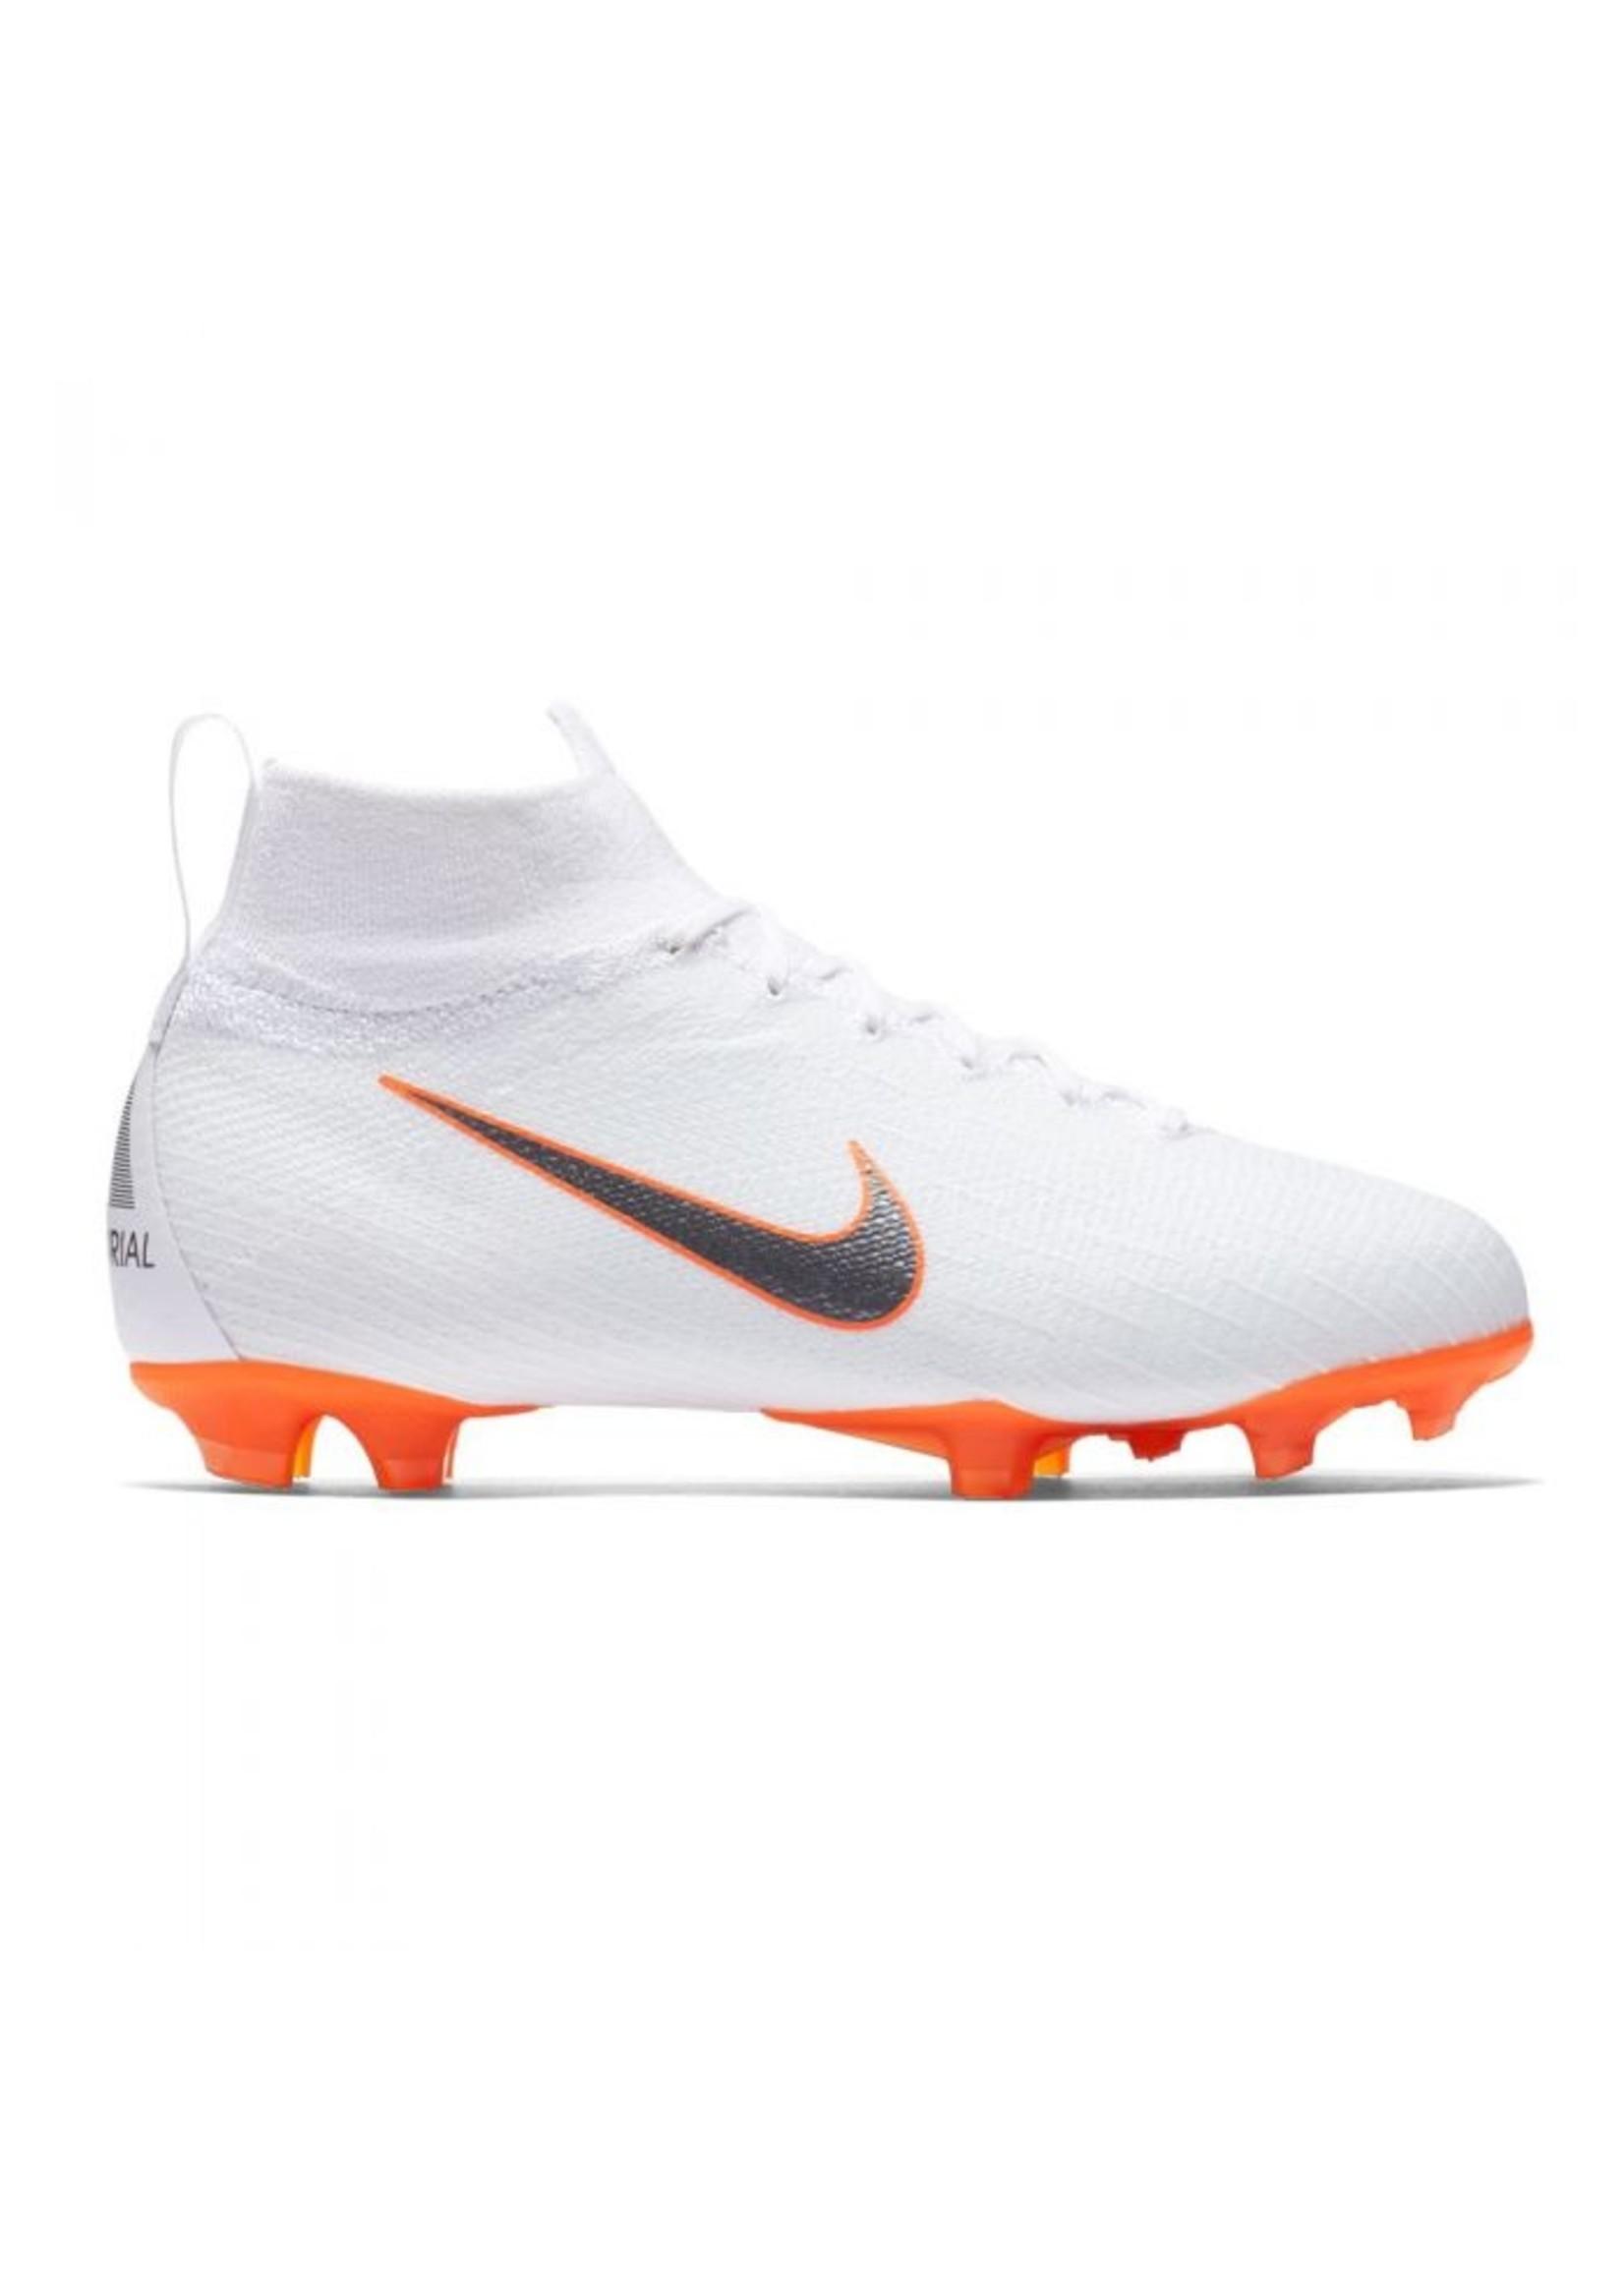 Nike JR SUPERFLY 6 ELITE FG